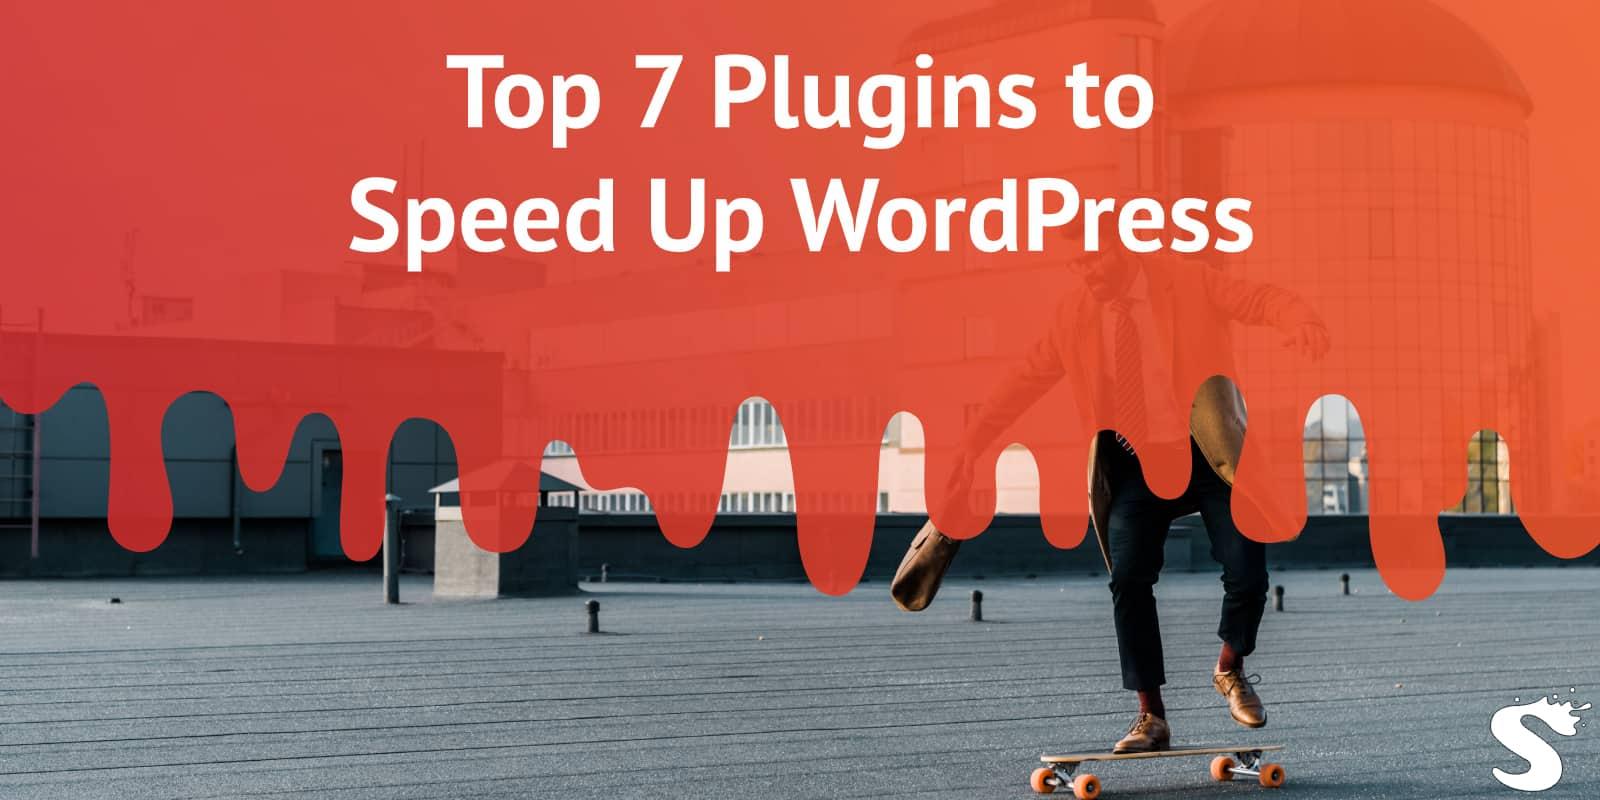 Top 7 plugins to speed up WordPress